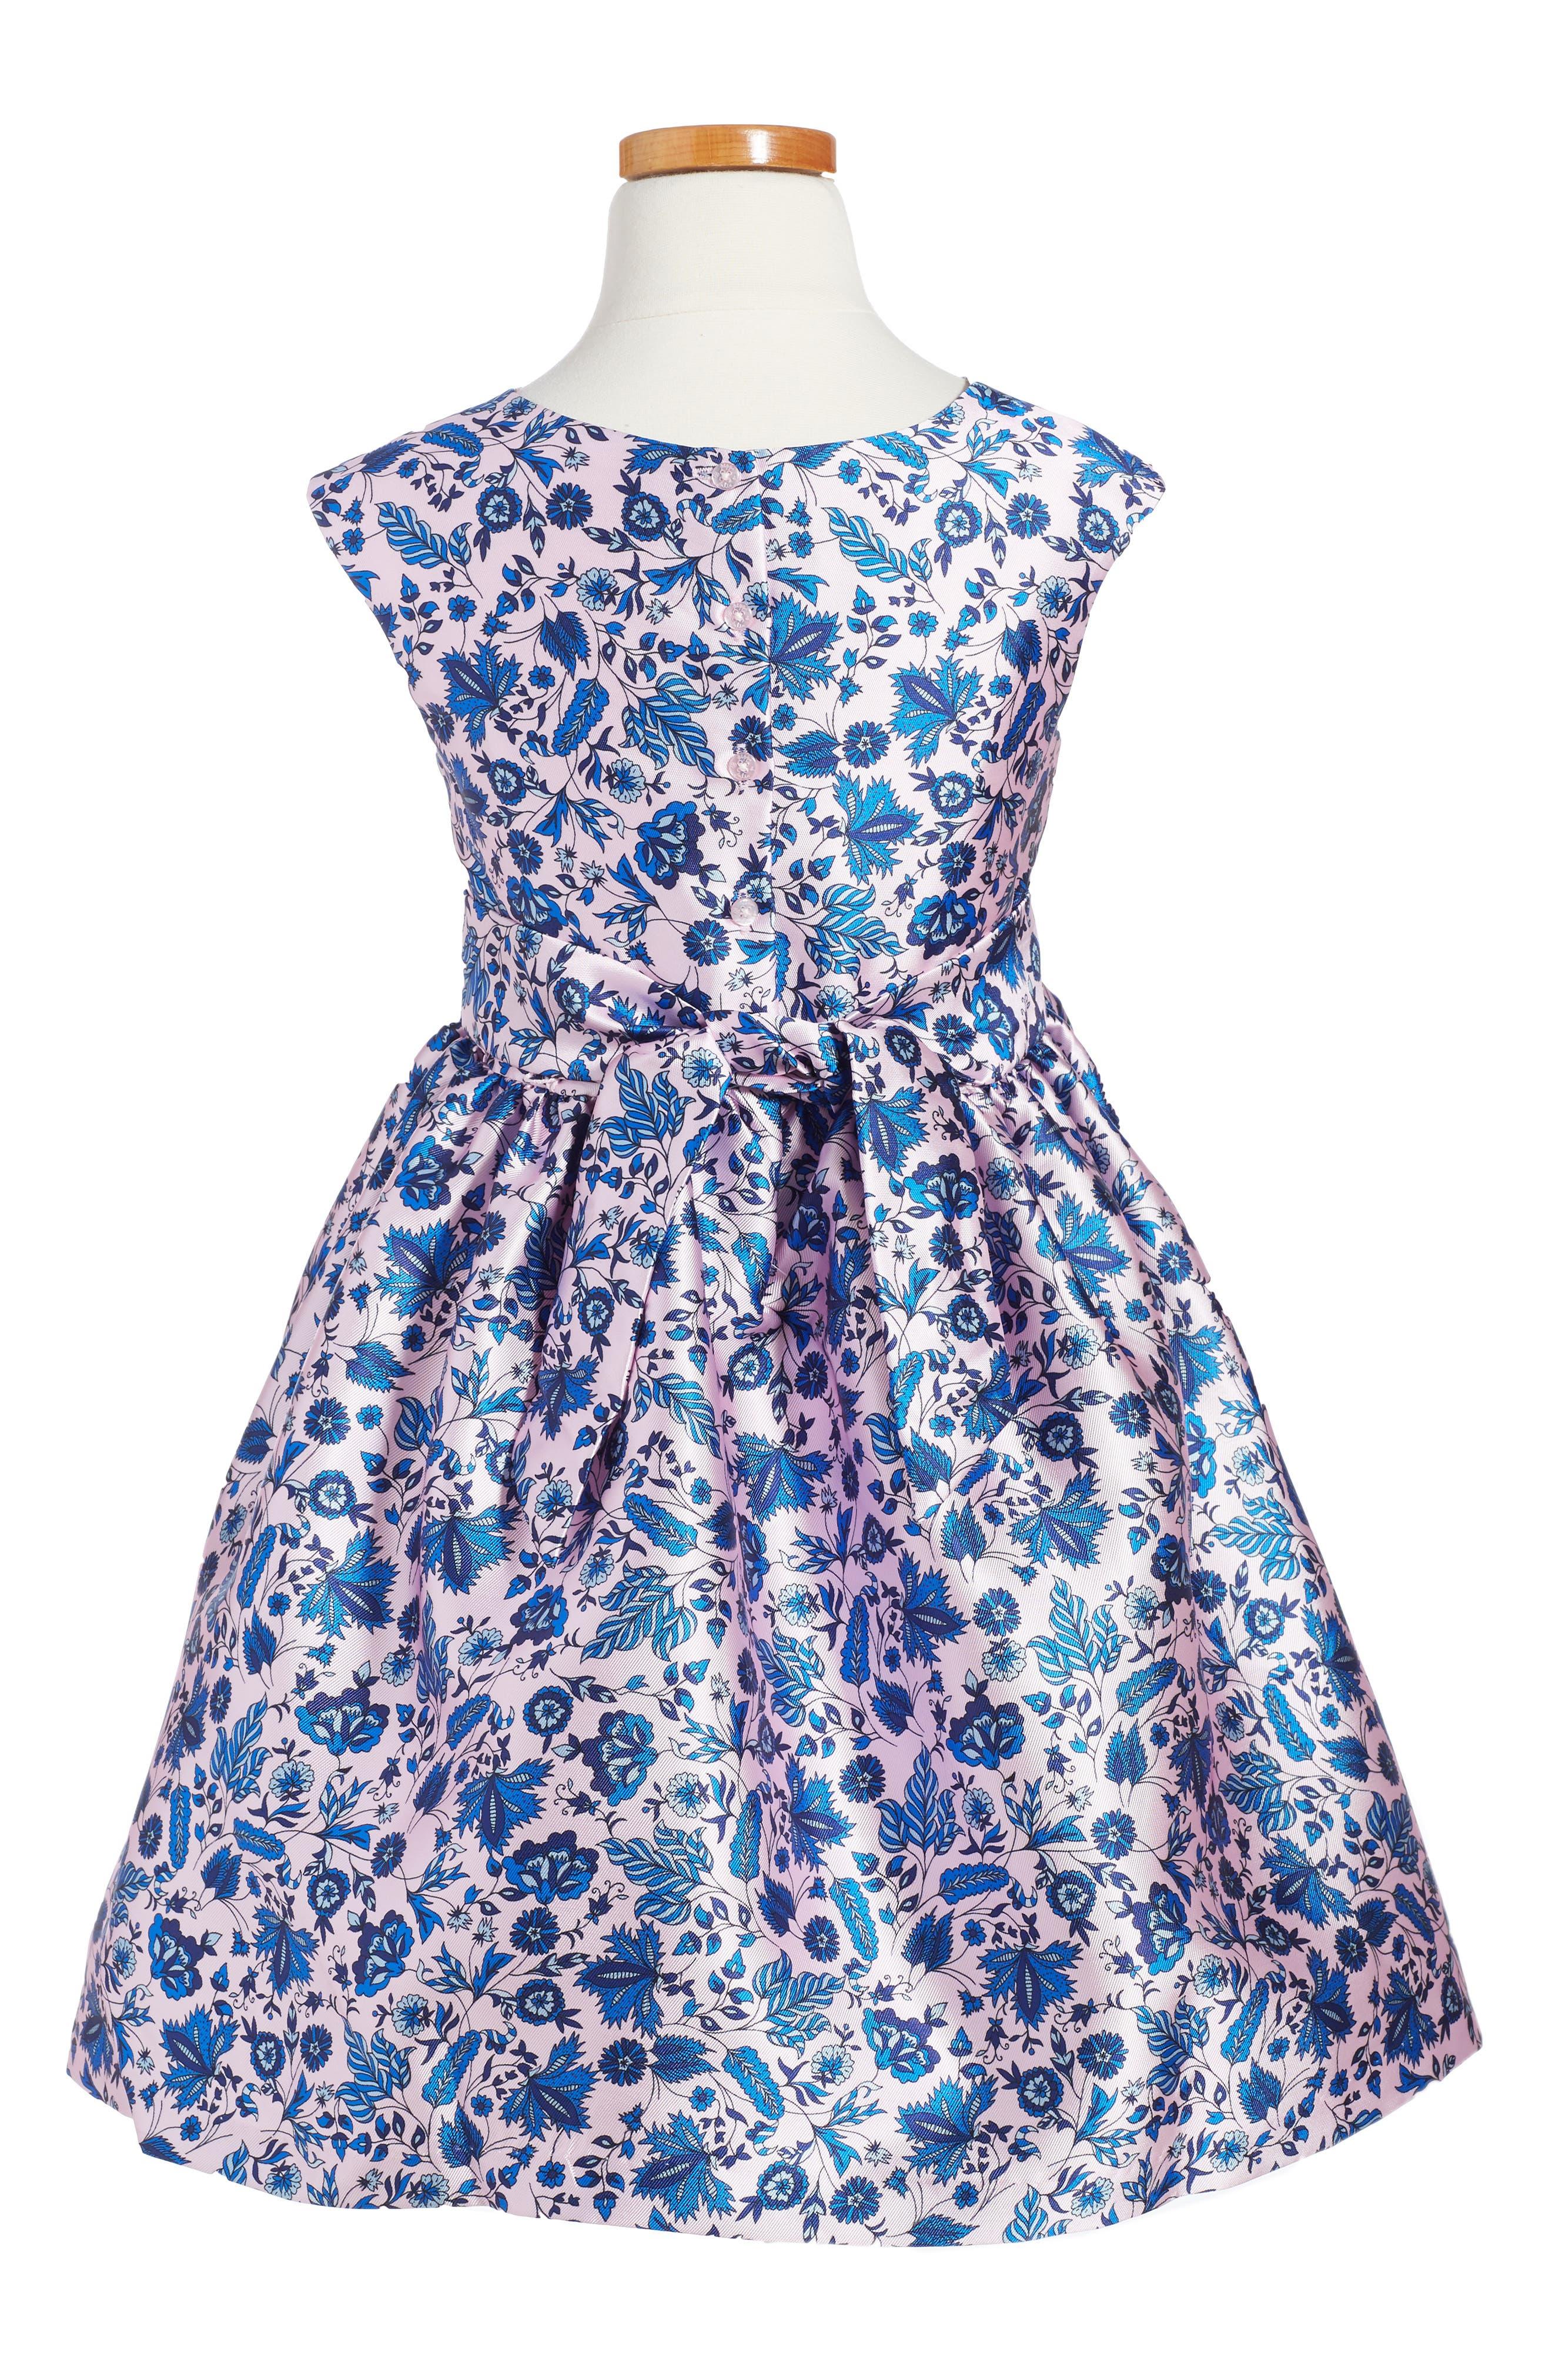 Alternate Image 2  - Pippa & Julie Print Fit & Flare Dress (Toddler Girls, Little Girls & Big Girls)